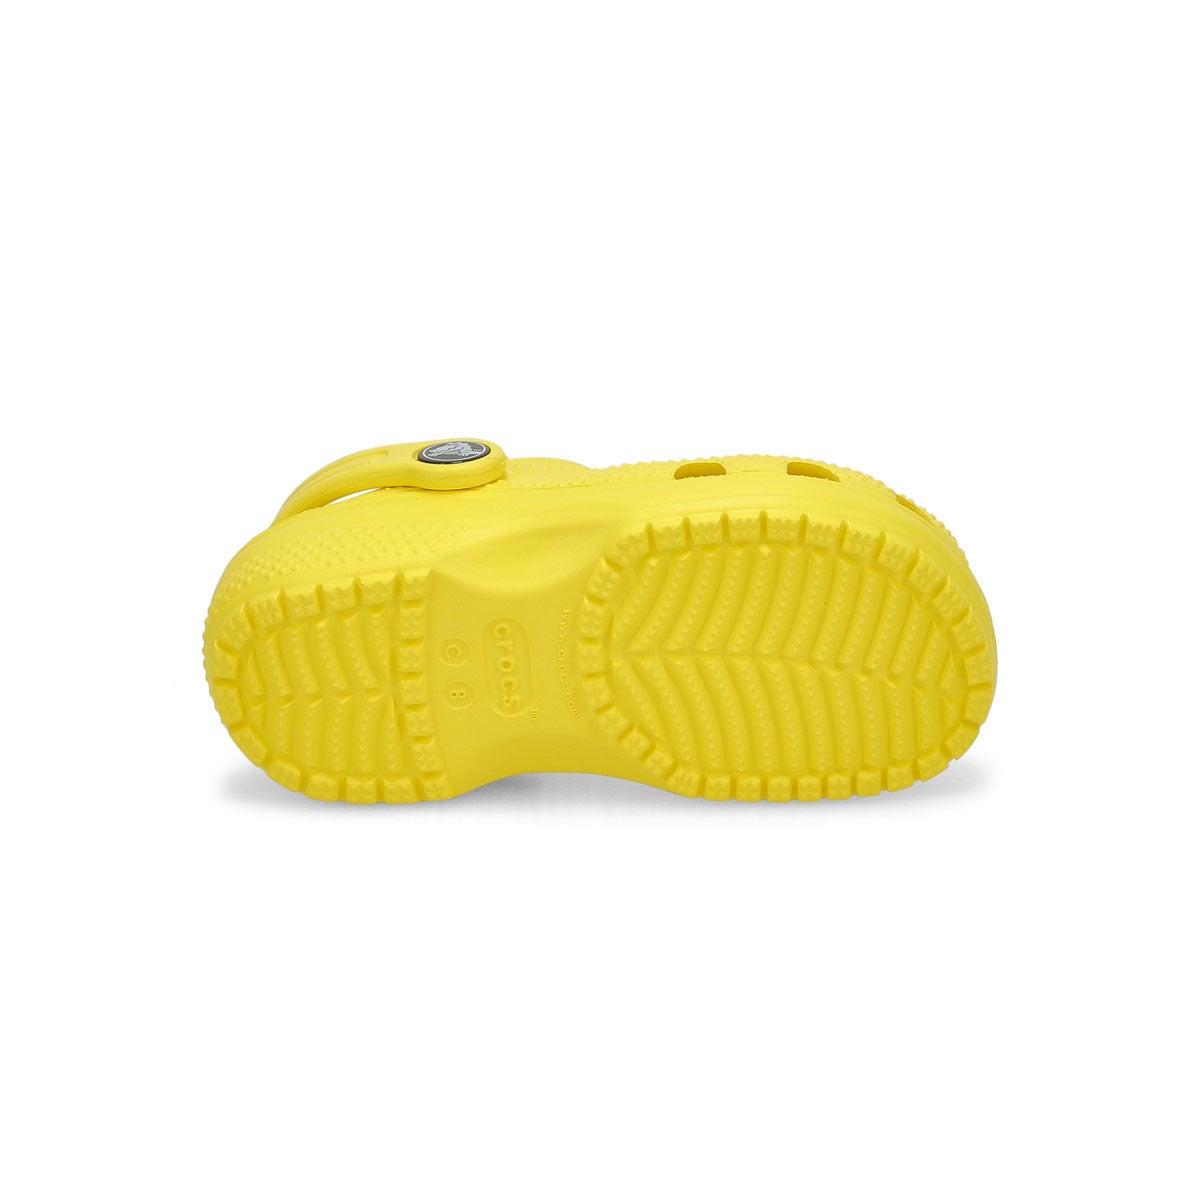 Infs Classic lemon EVA comfort clog